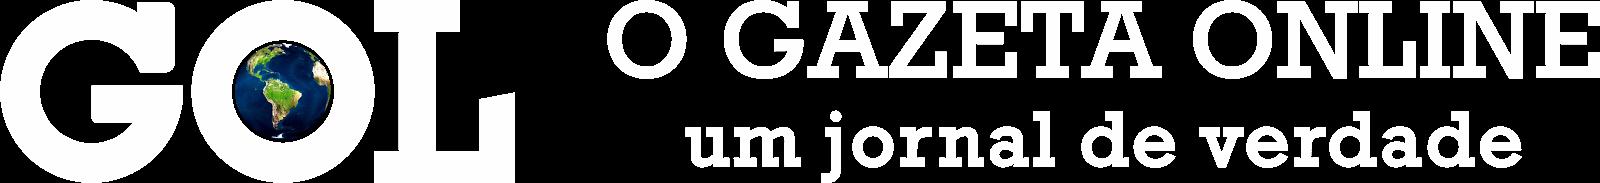 JORNAL O GAZETA